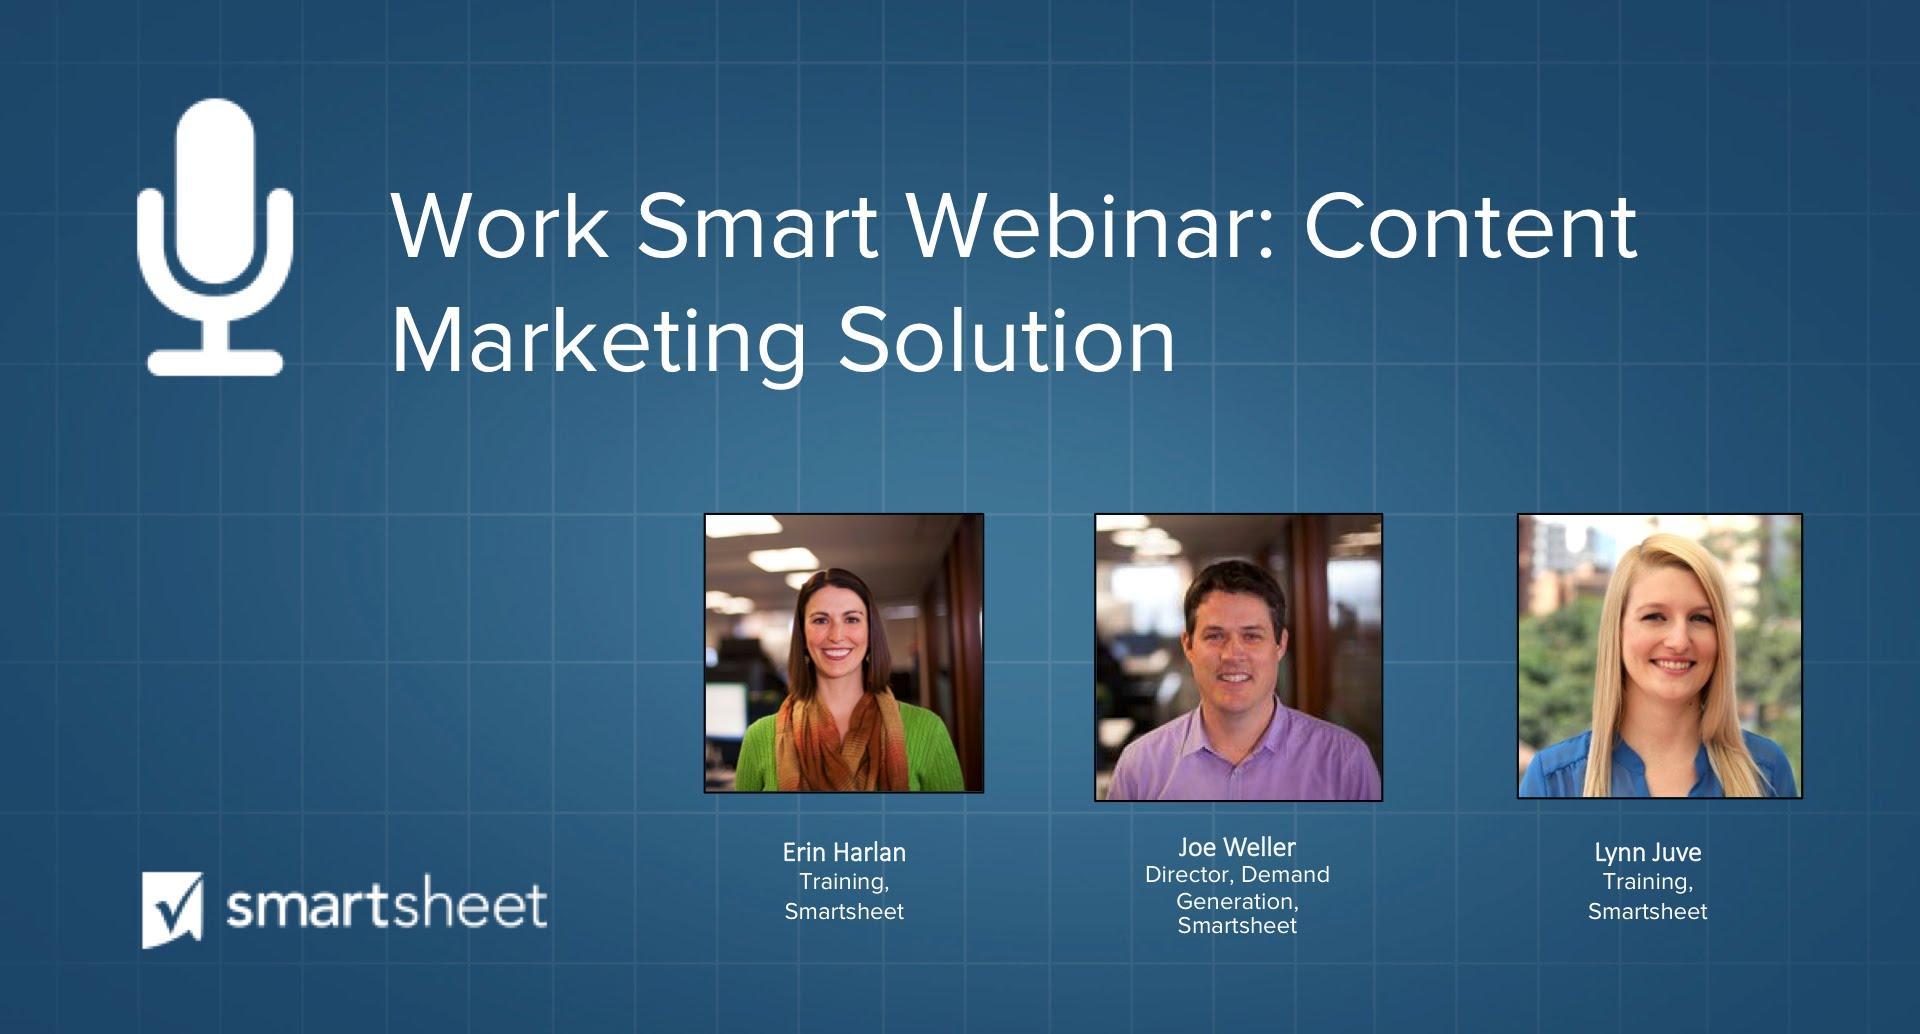 Content Marketing Solution | Work Smart Webinar